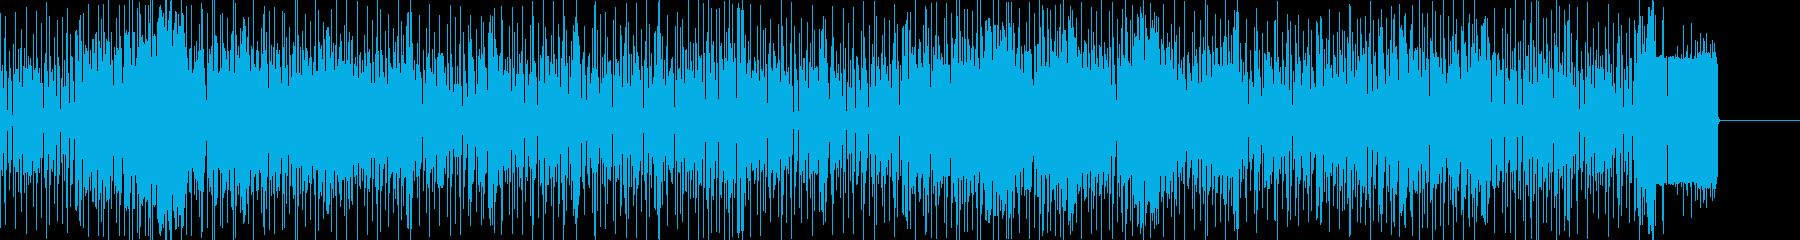 elusiveとは神出鬼没と言う意味で…の再生済みの波形